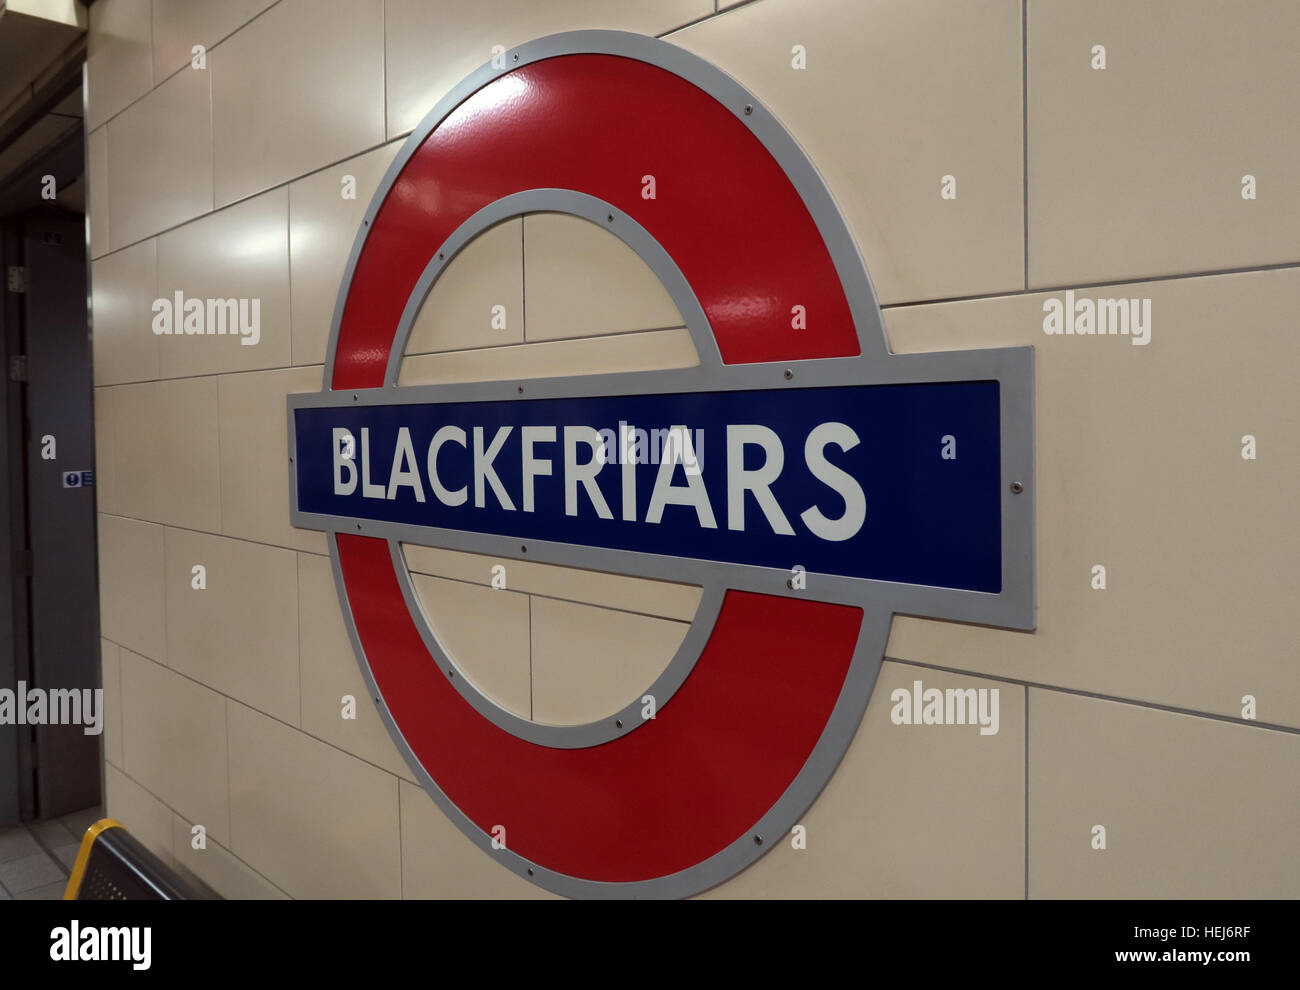 Blackfriars Tube Station, London City Centre,England,UK - Stock Image